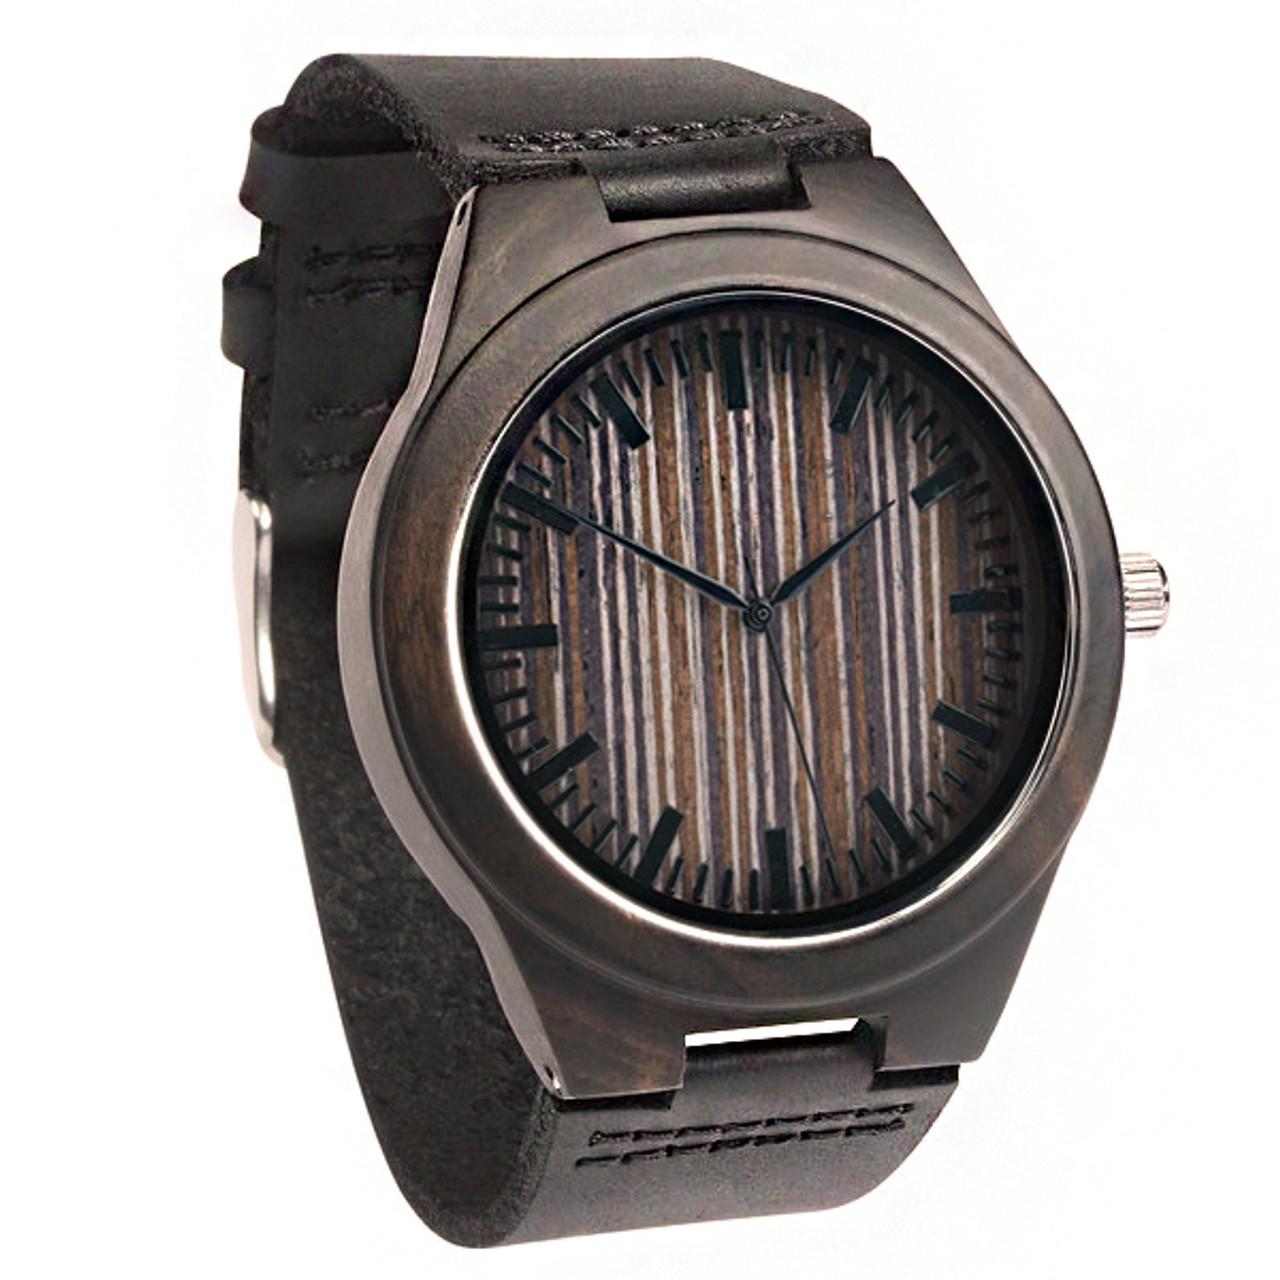 Grpn Spain - Wood Engraved Watch W#66 - Apex